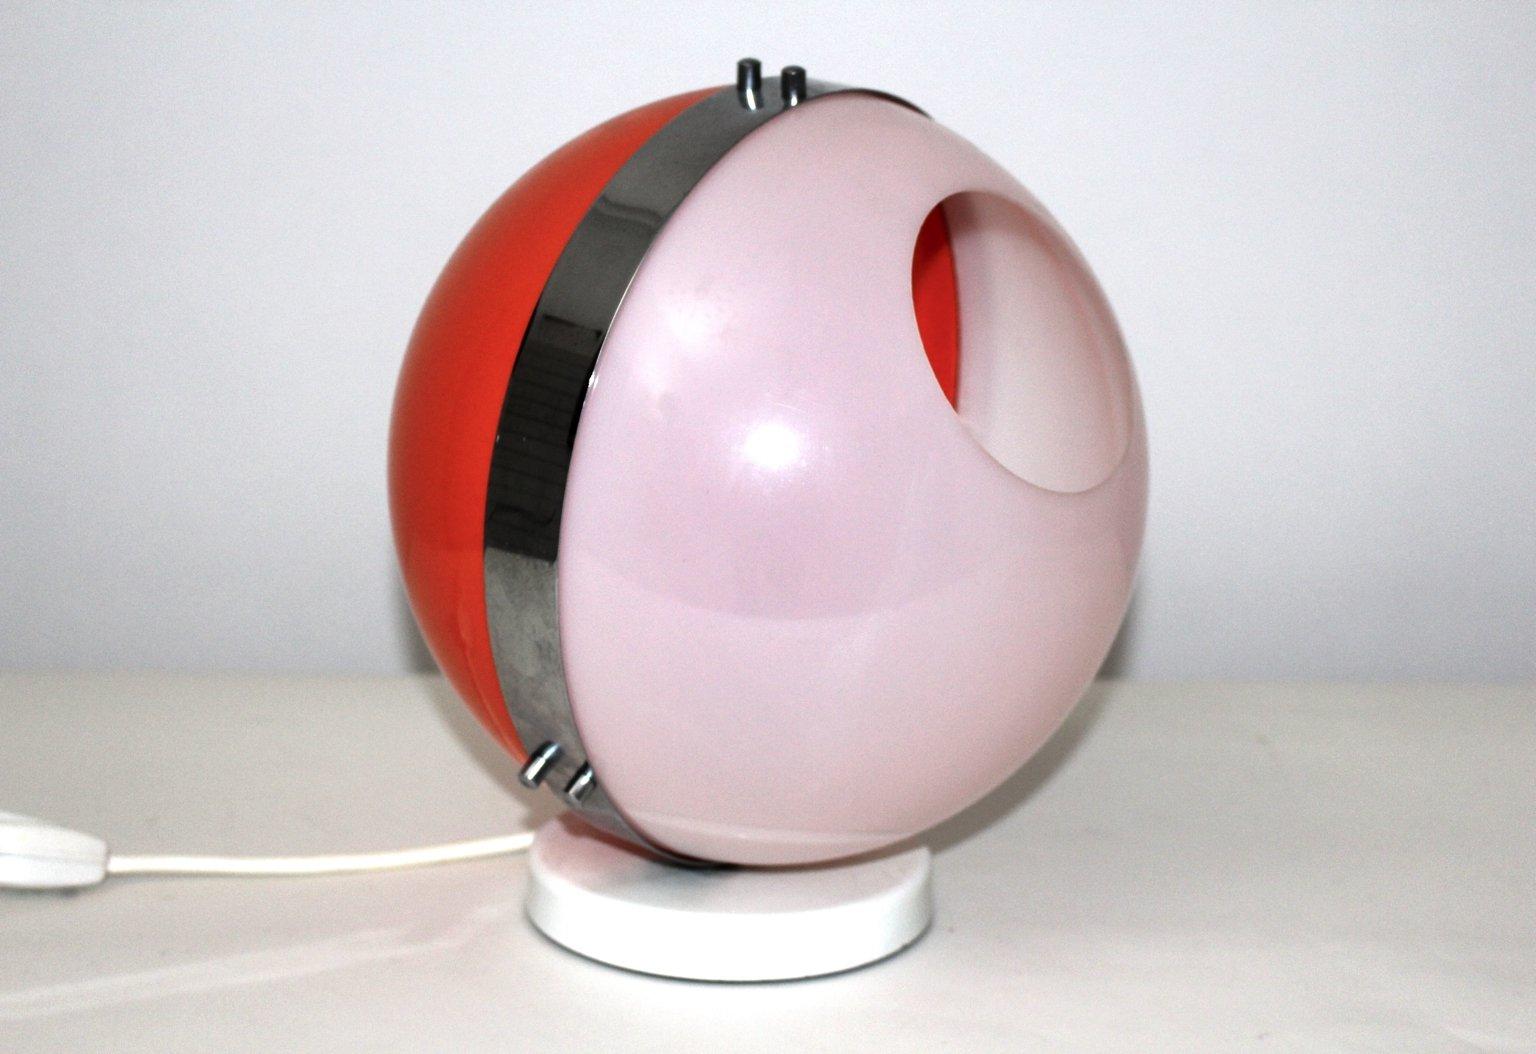 Tischlampe Modell Plexi Ball aus Kunststoff, 1970er